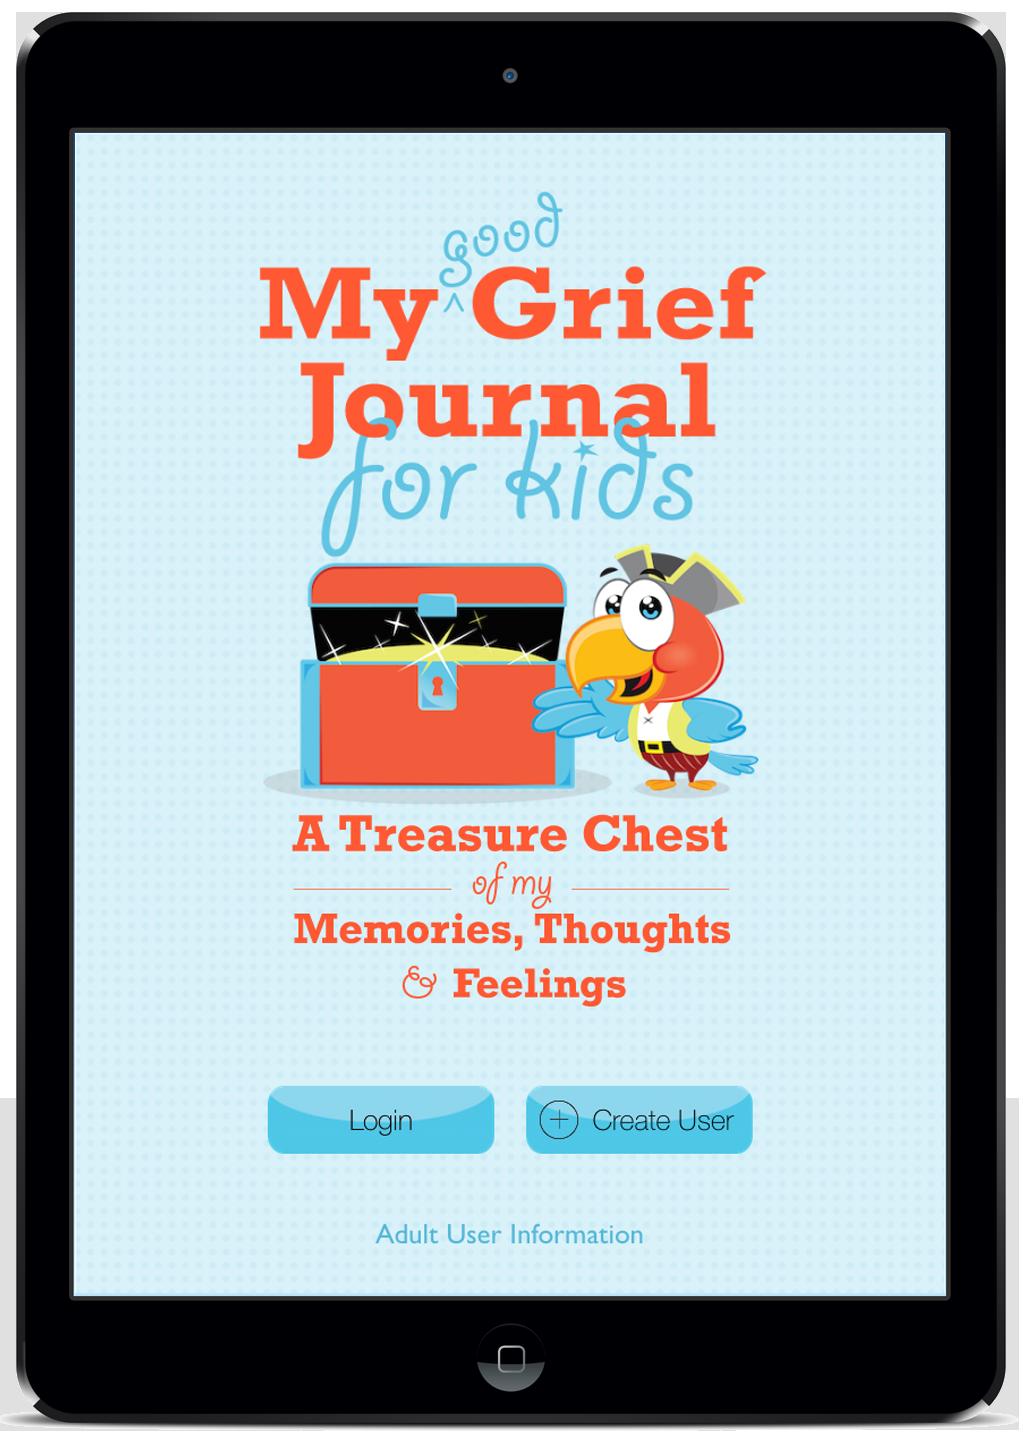 Landing Page Image w iPad